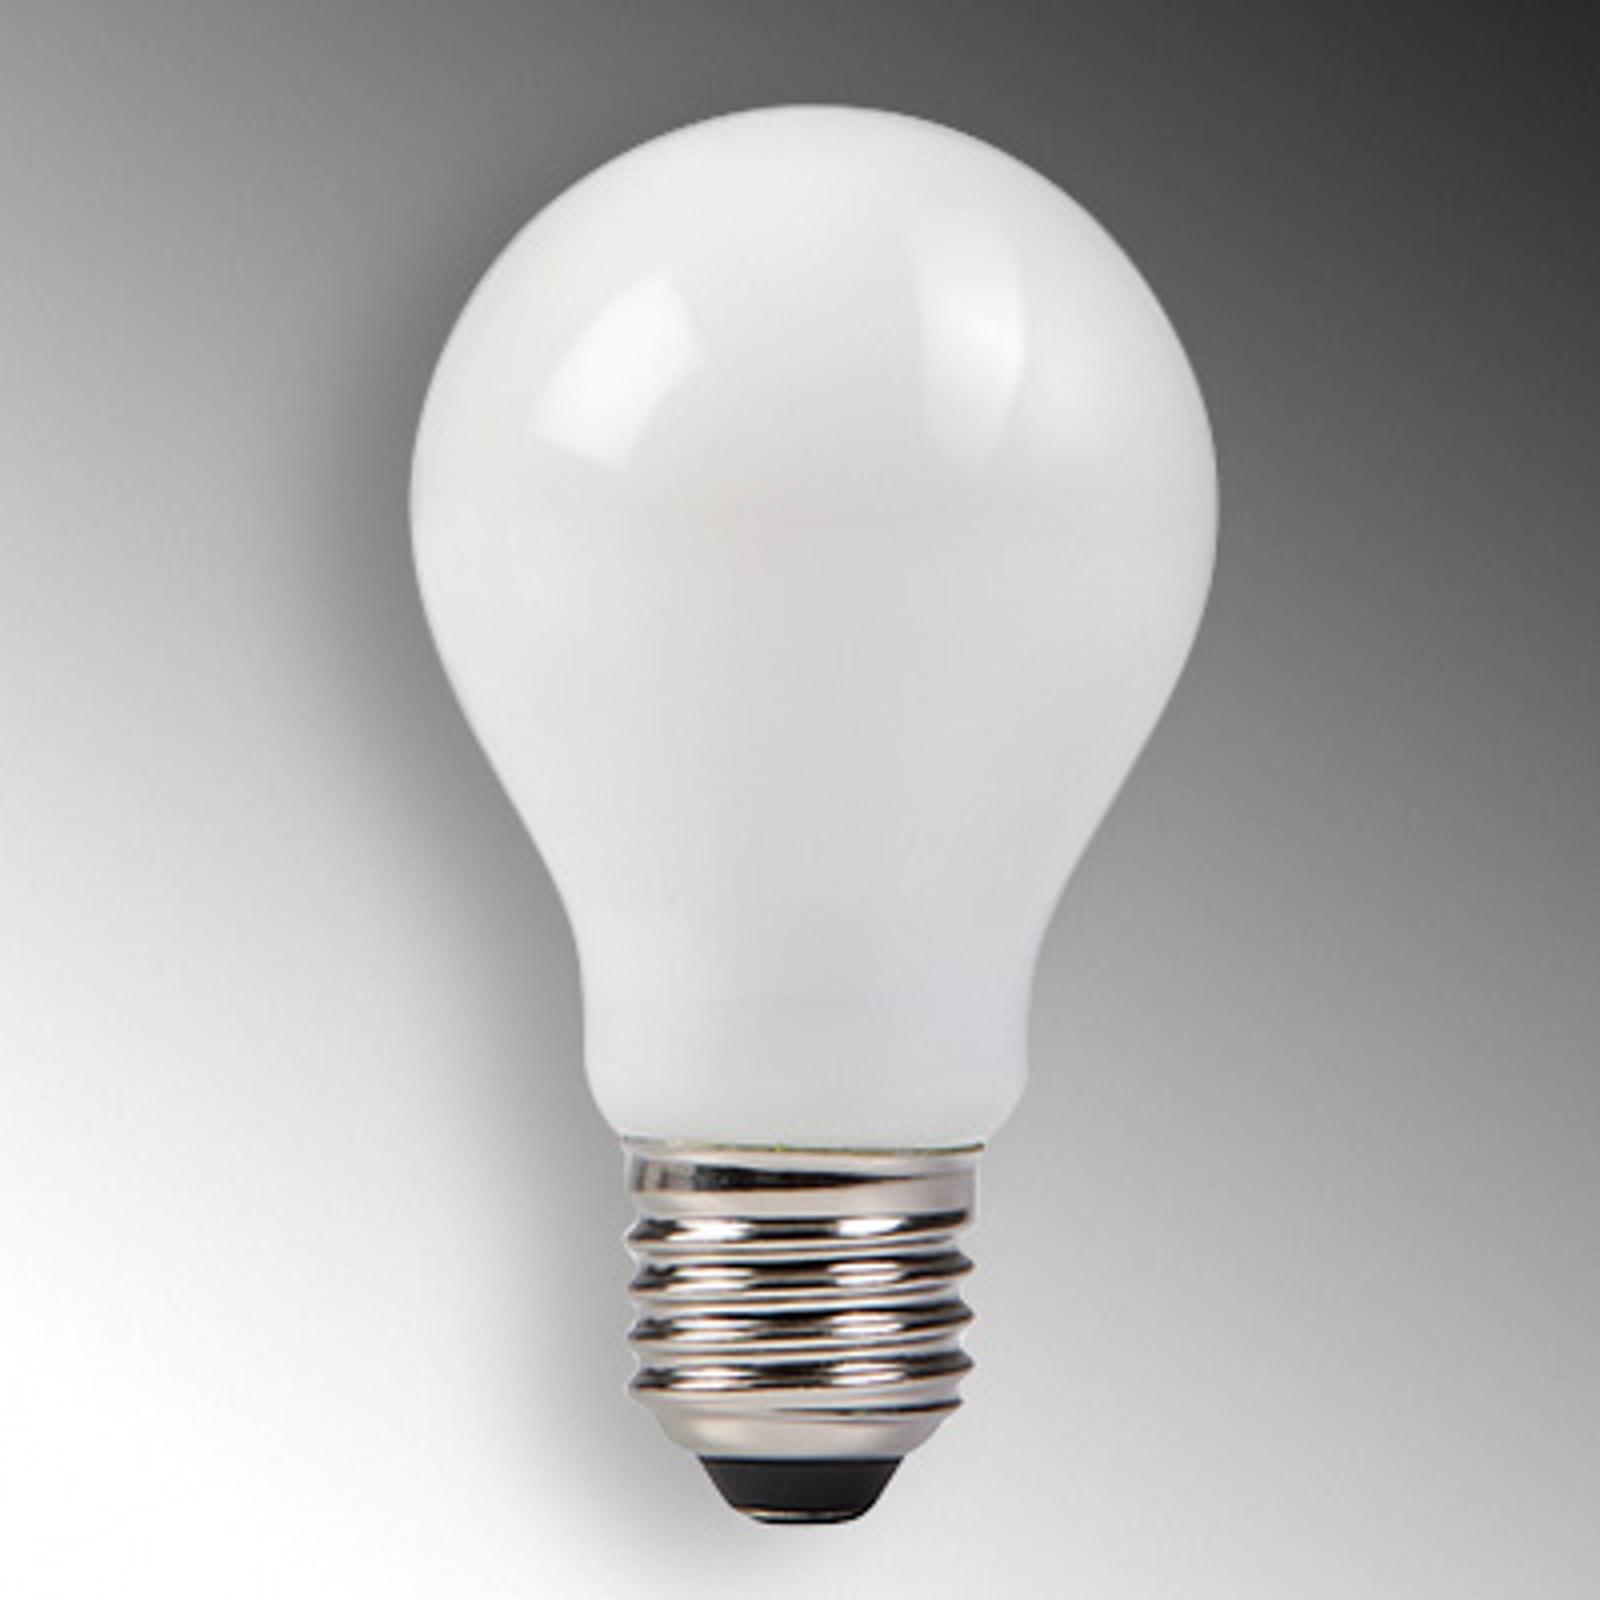 Acquista Lampadina LED forma classica 827 E27 4W satinata